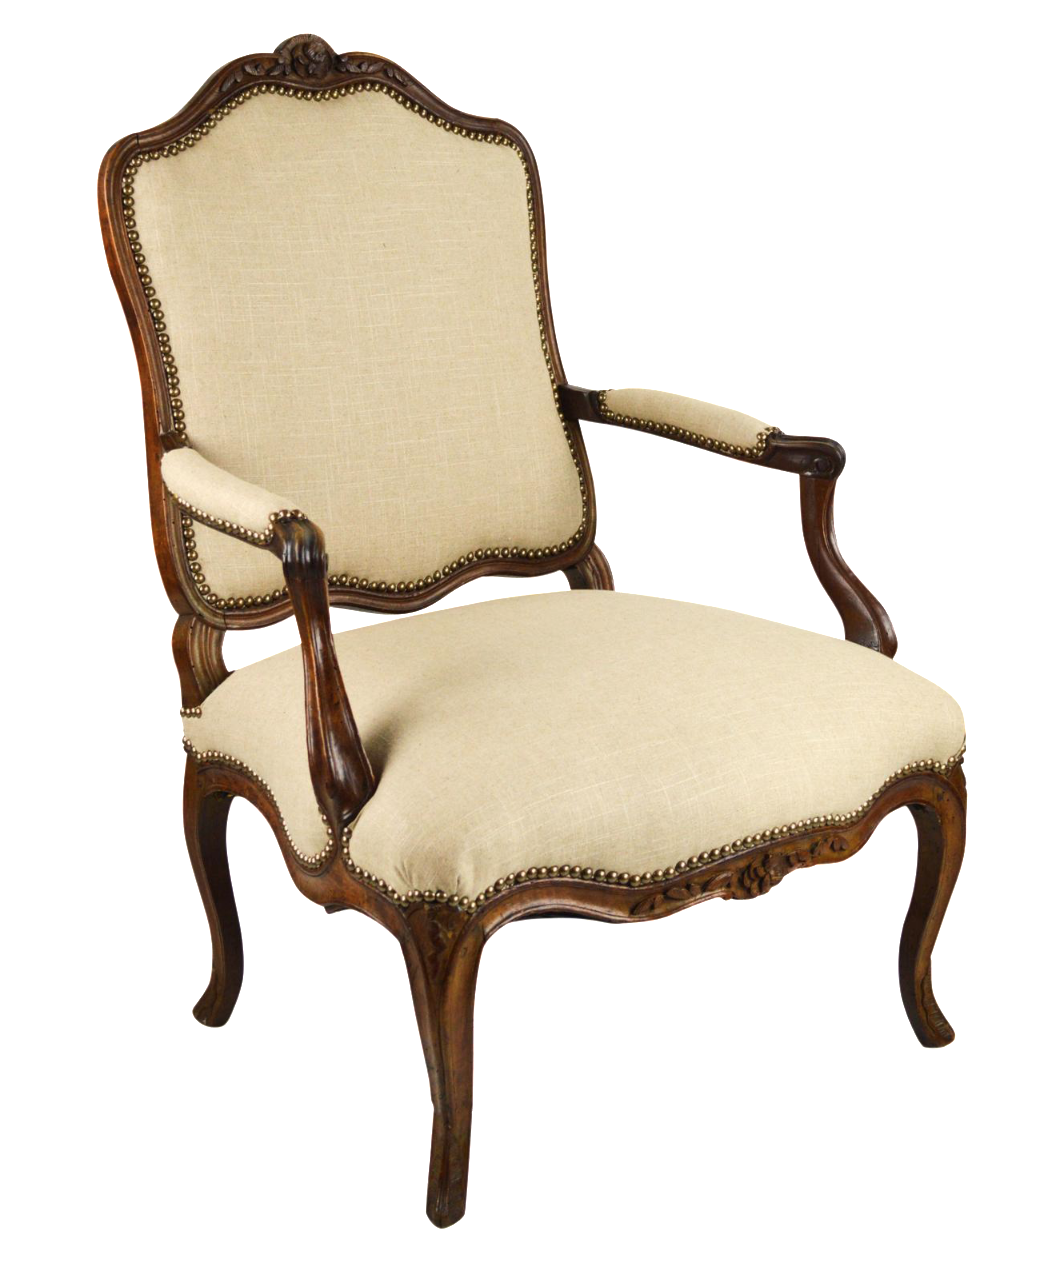 louis xv style linen fauteuil chair chairish